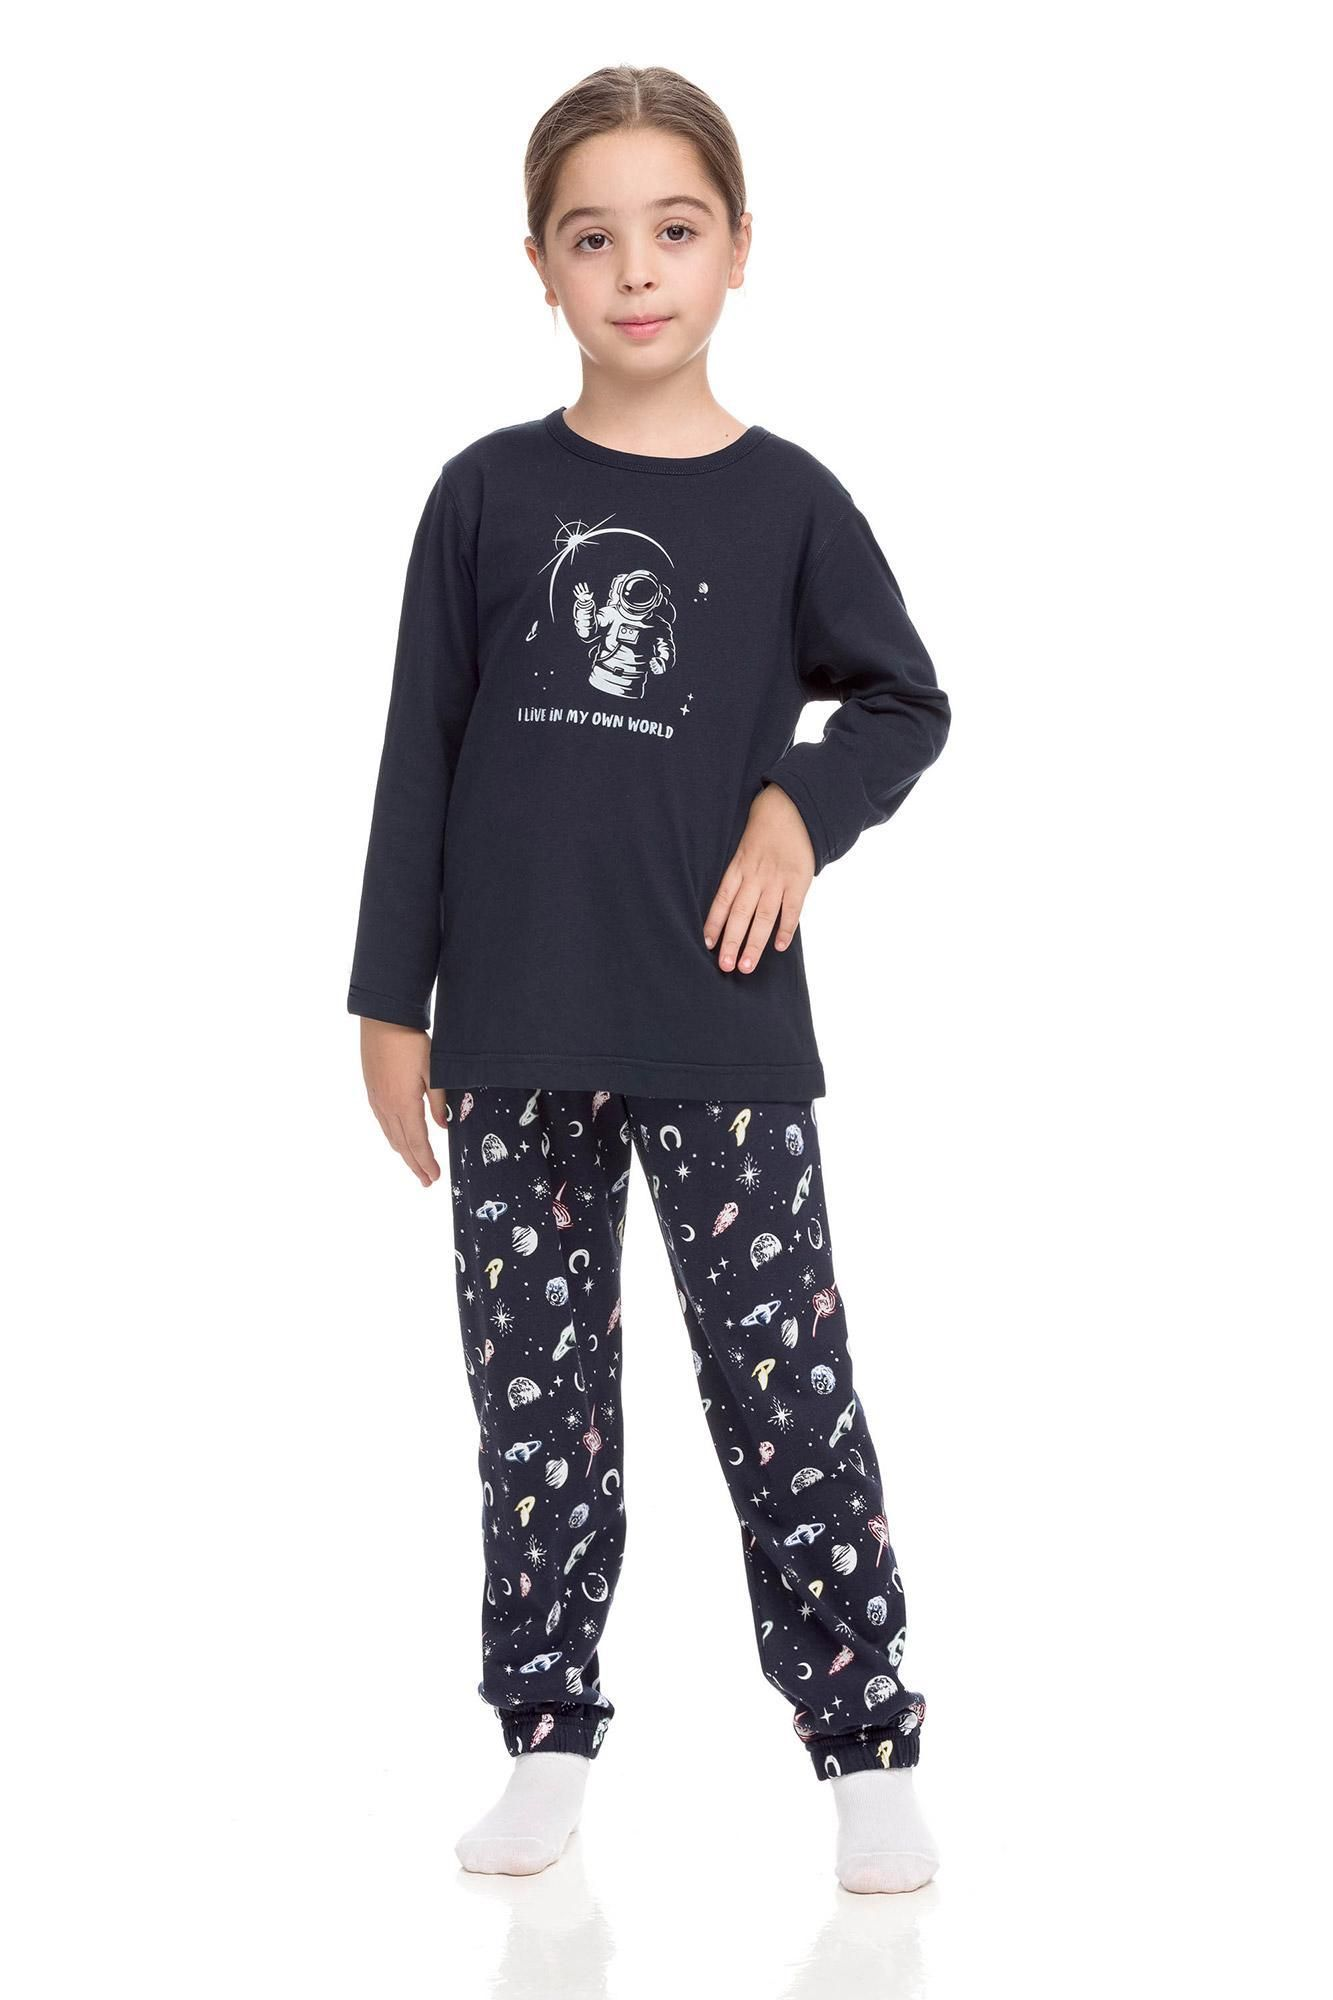 Kid's Cotton Pyjamas with planets